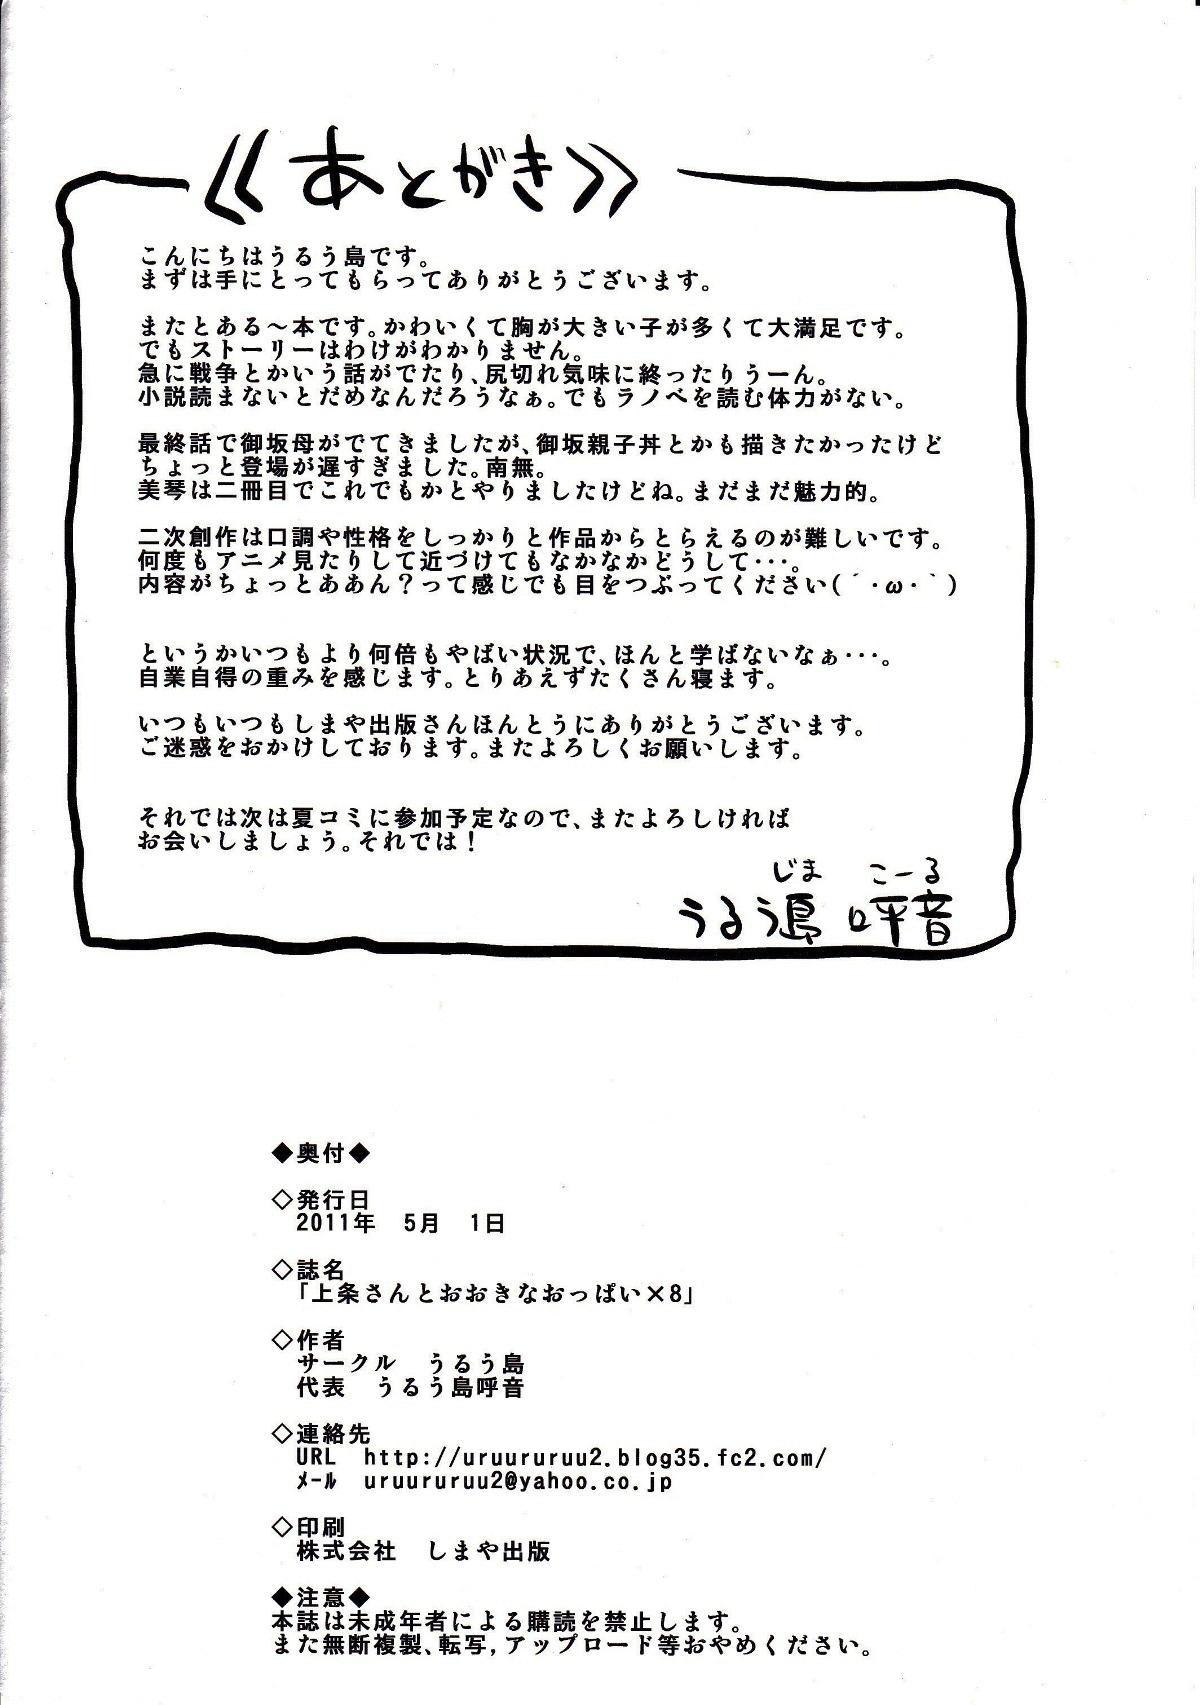 (COMIC1☆5) [Uruujima (Uruujima Call)] Kamijou-san to Ookina Oppai x8 | Kamijou-san And Eight Big Boobs (Toaru Majutsu no Index) [English] =Trigoris Translates= 33